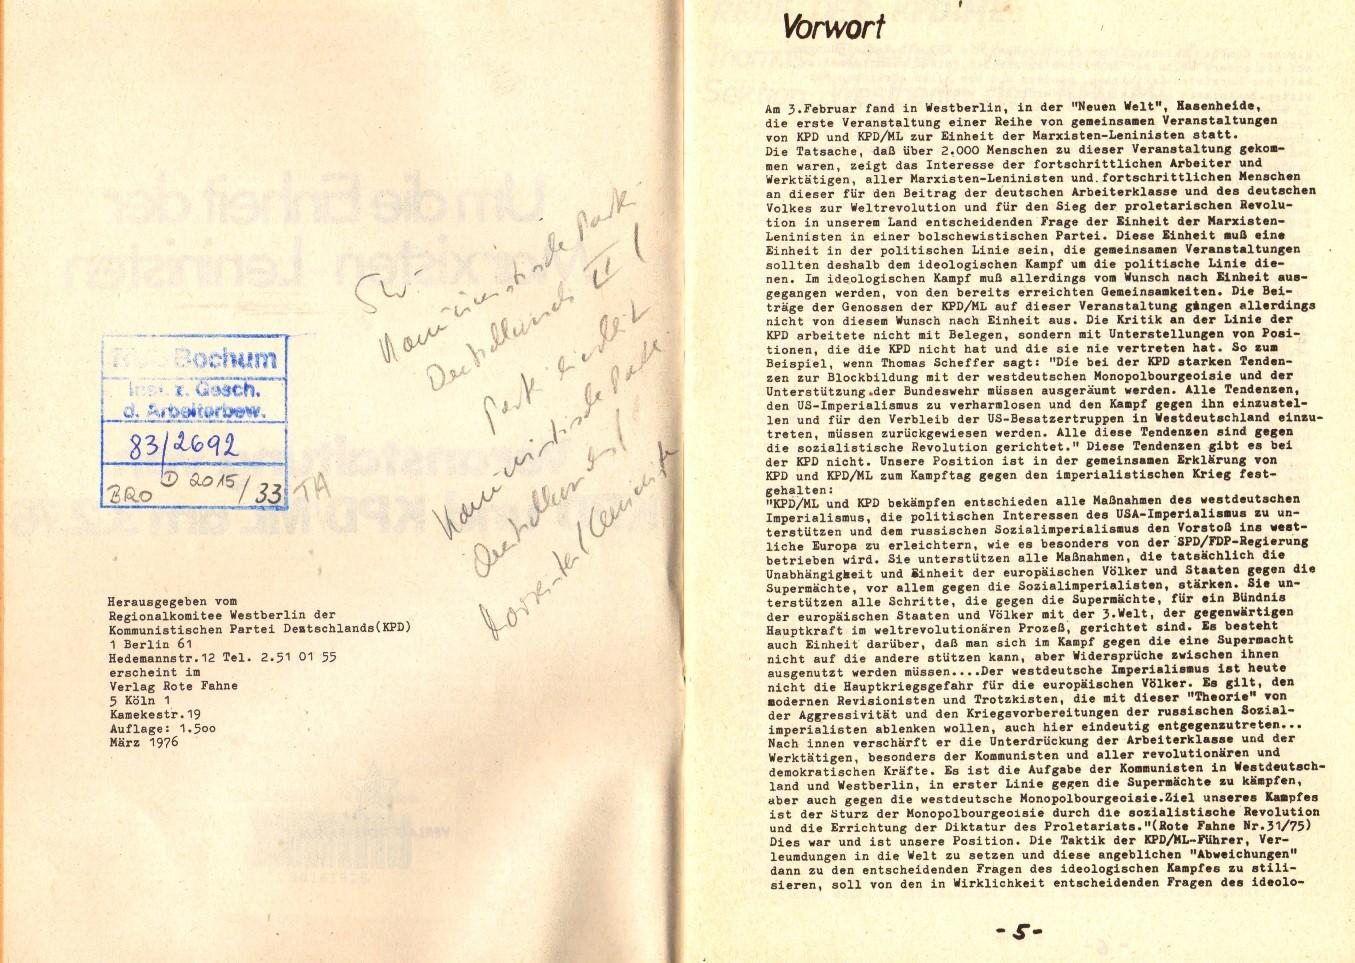 Berlin_AO_1976_Veranstaltung_mit_KPDML_03